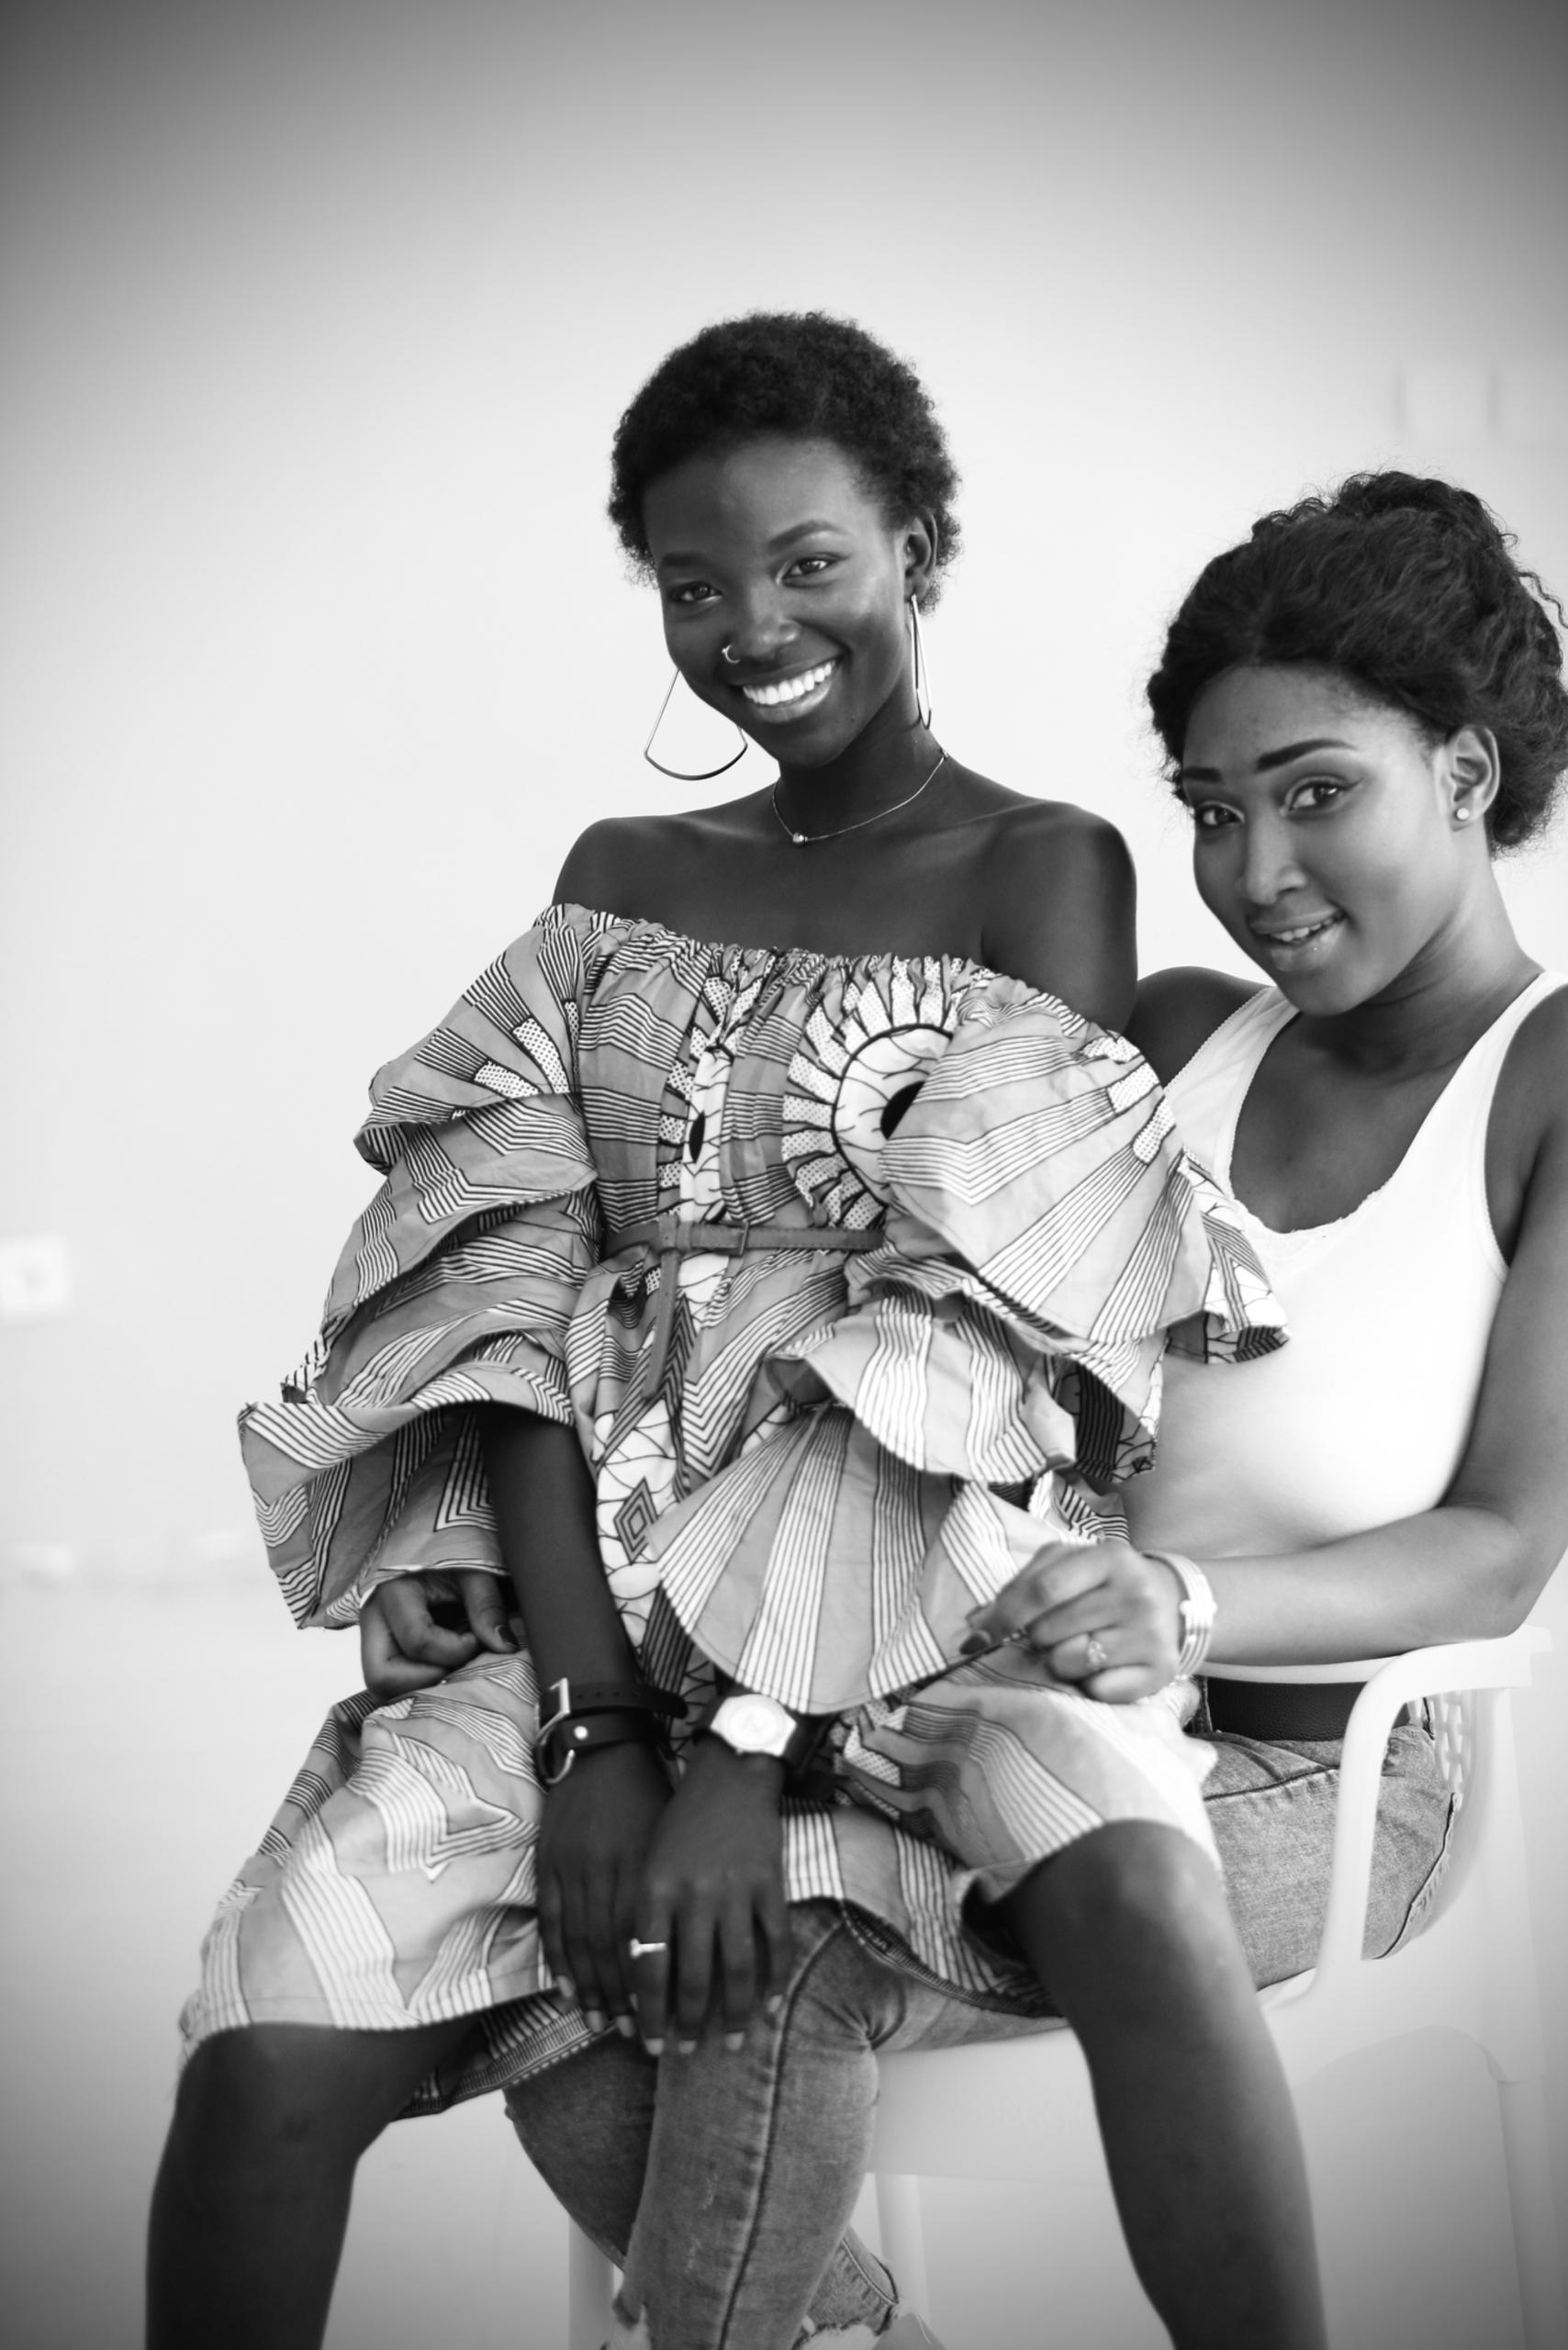 African Beauty Dakar Senegal - mi3rdeye | ello